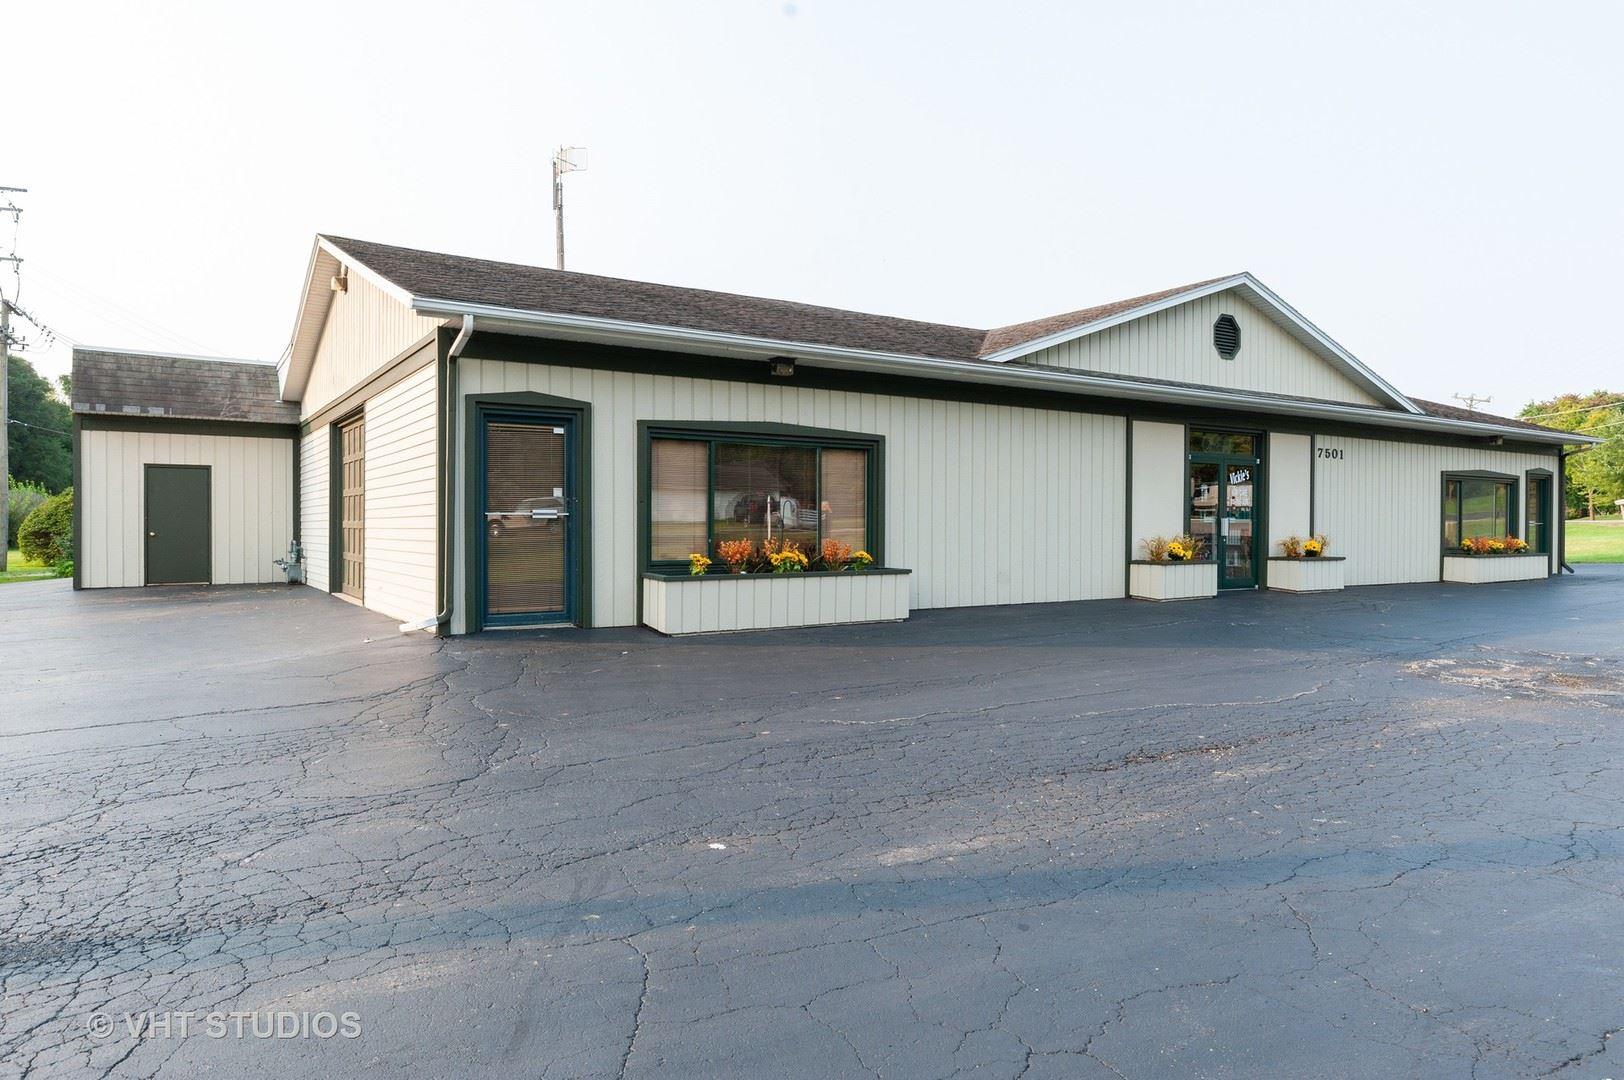 7501 Howe Road, Wonder Lake, IL 60097 - #: 10997312